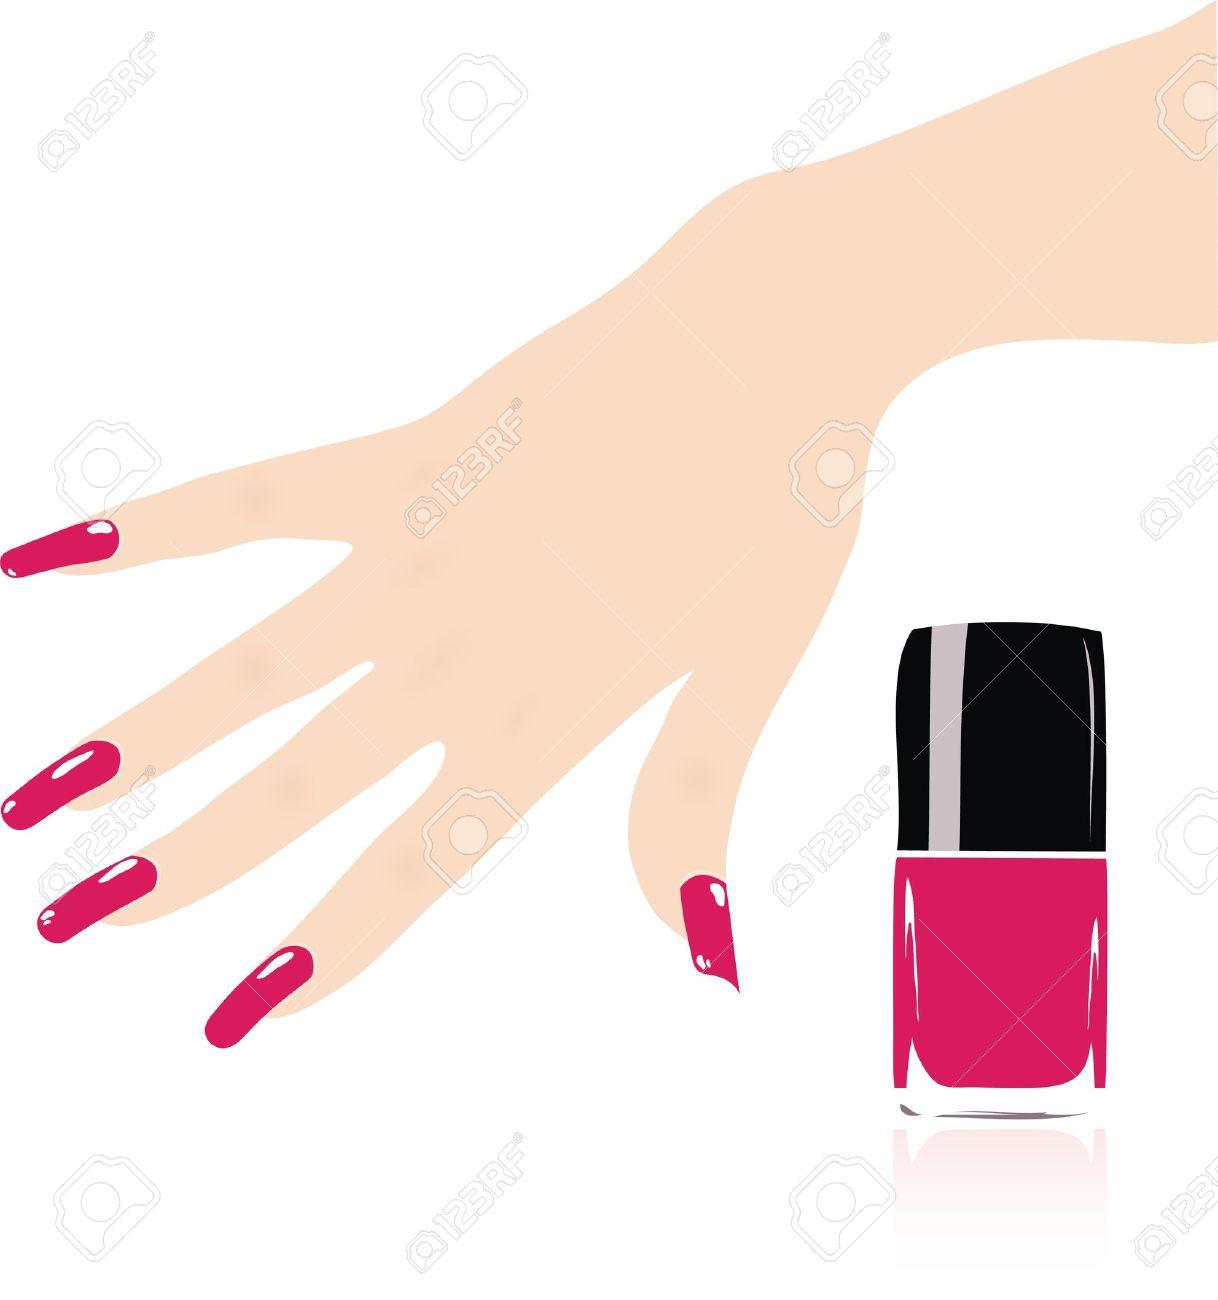 Nail Salon Woman Hand With